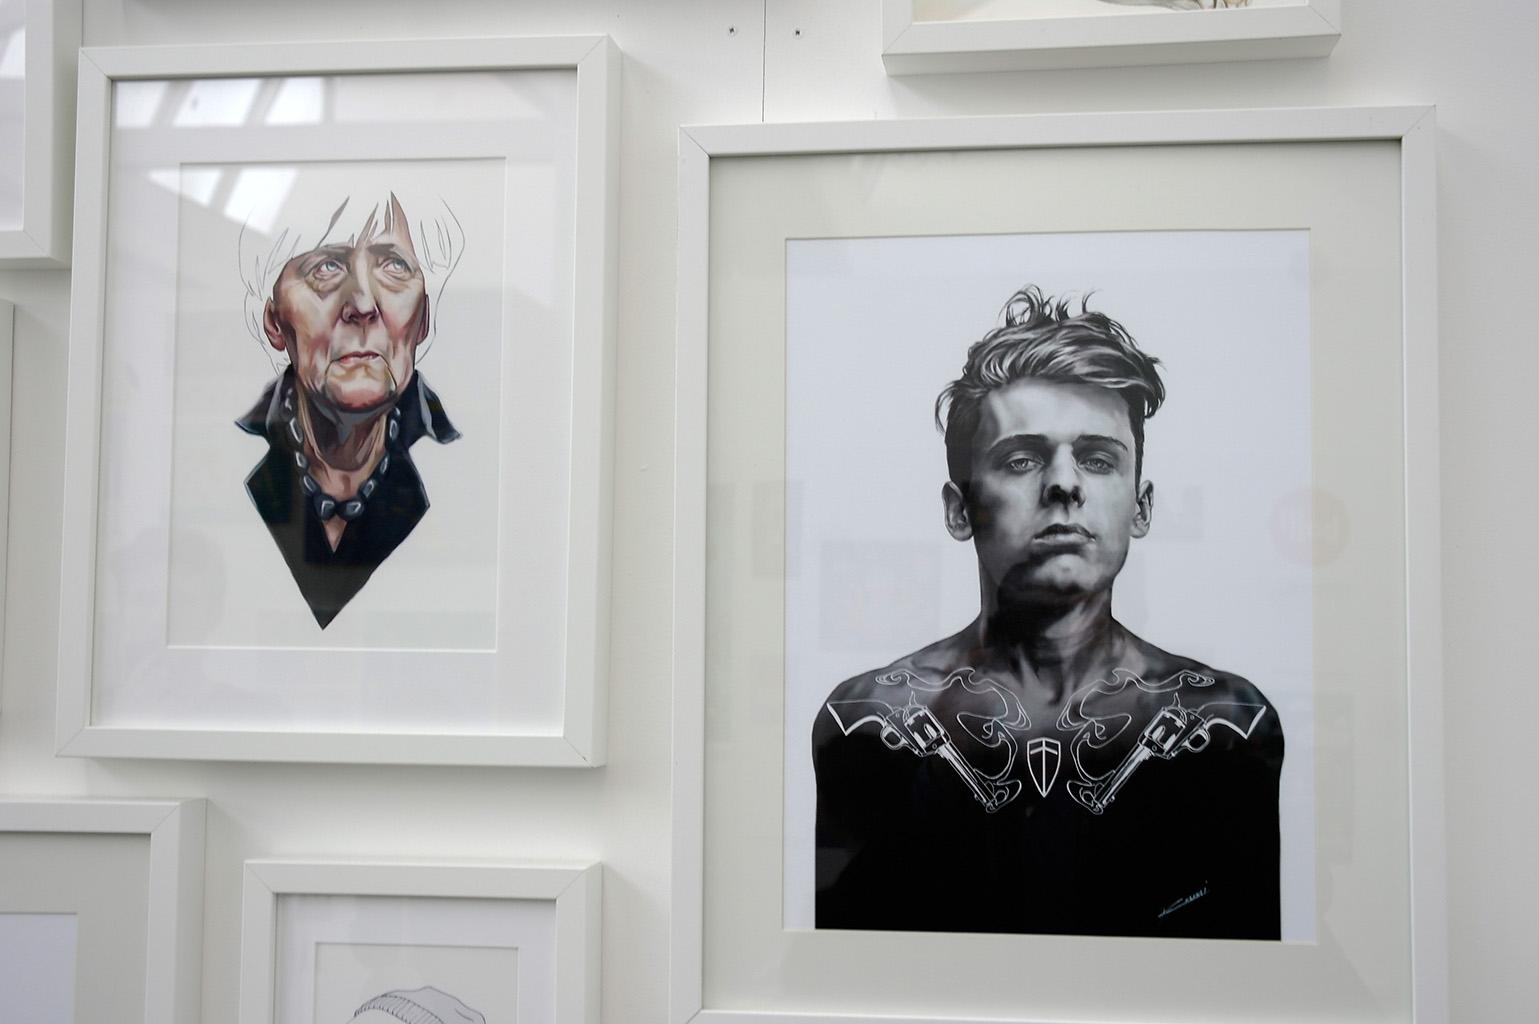 illu16-illustratoren-festival-köln-merkel-hans-christian-sanladerer